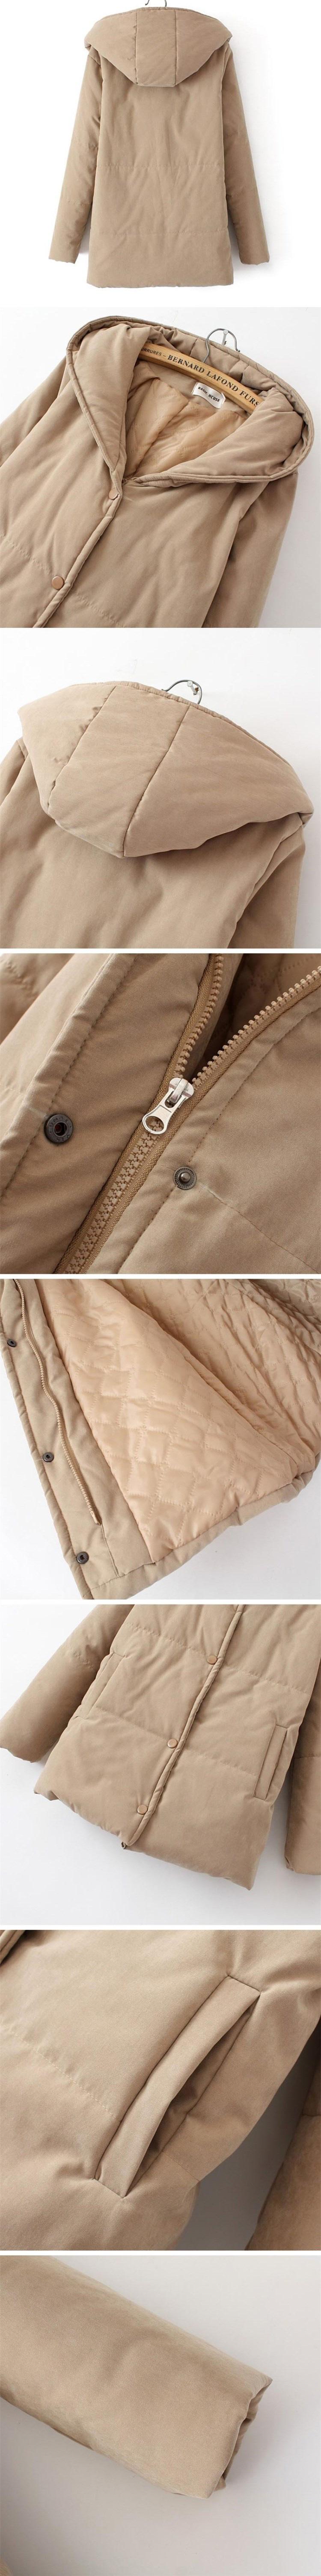 womens-plus-size-jacket-hooded-cotton-down-winter-coat-10-details